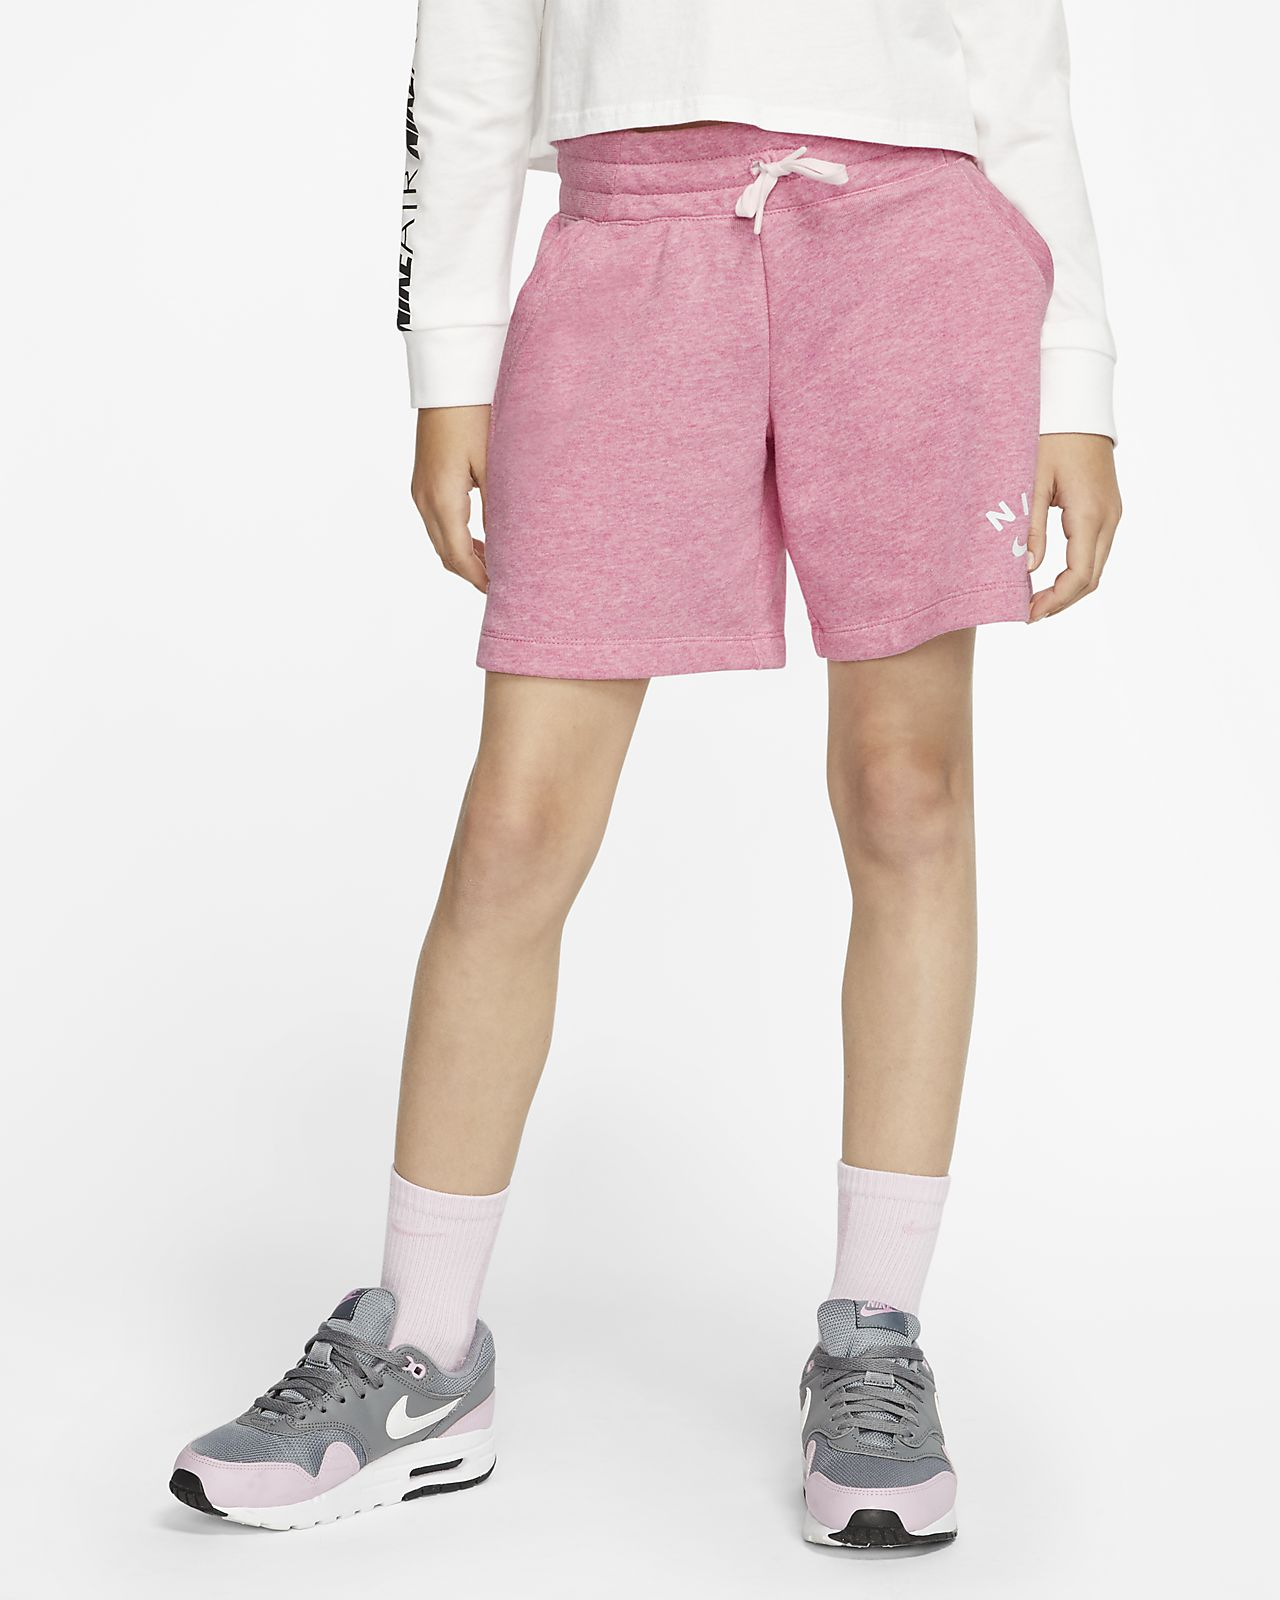 Calções Nike Sportswear Júnior (Rapariga)